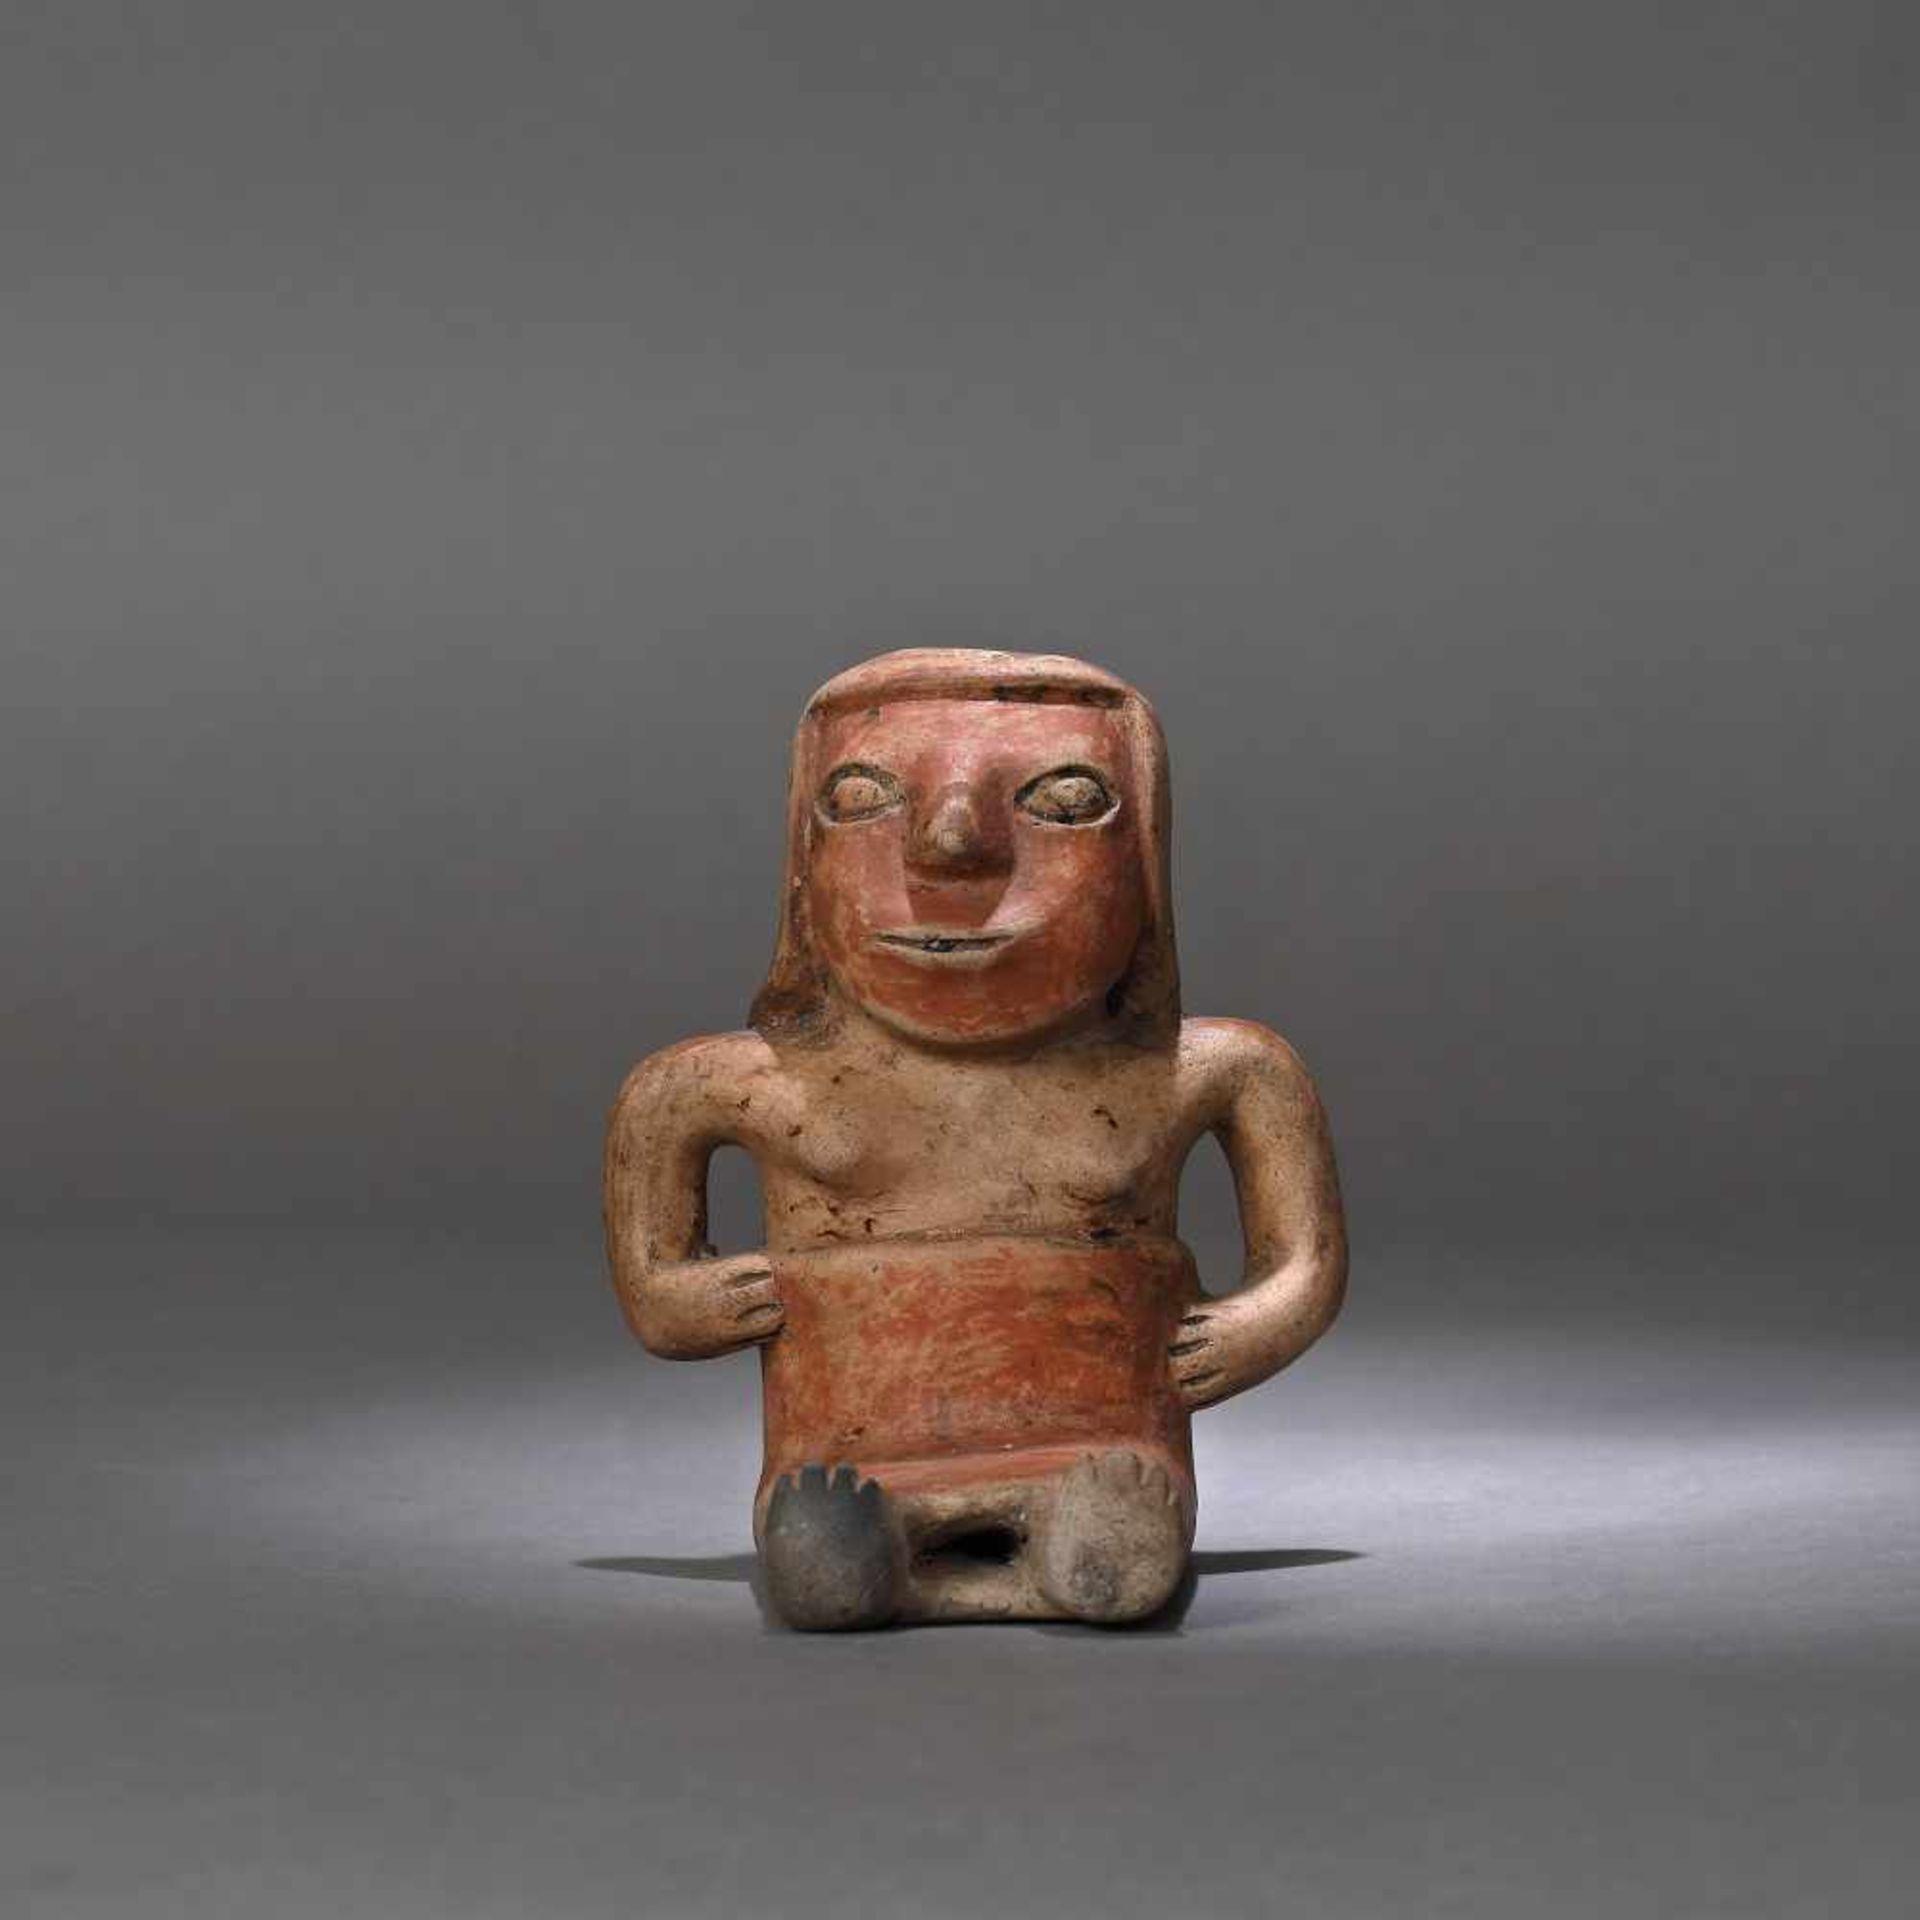 Ceramic statuette, depicting a female figure, Narino culture, Columbia, approx. 1,750 years old, 3rd